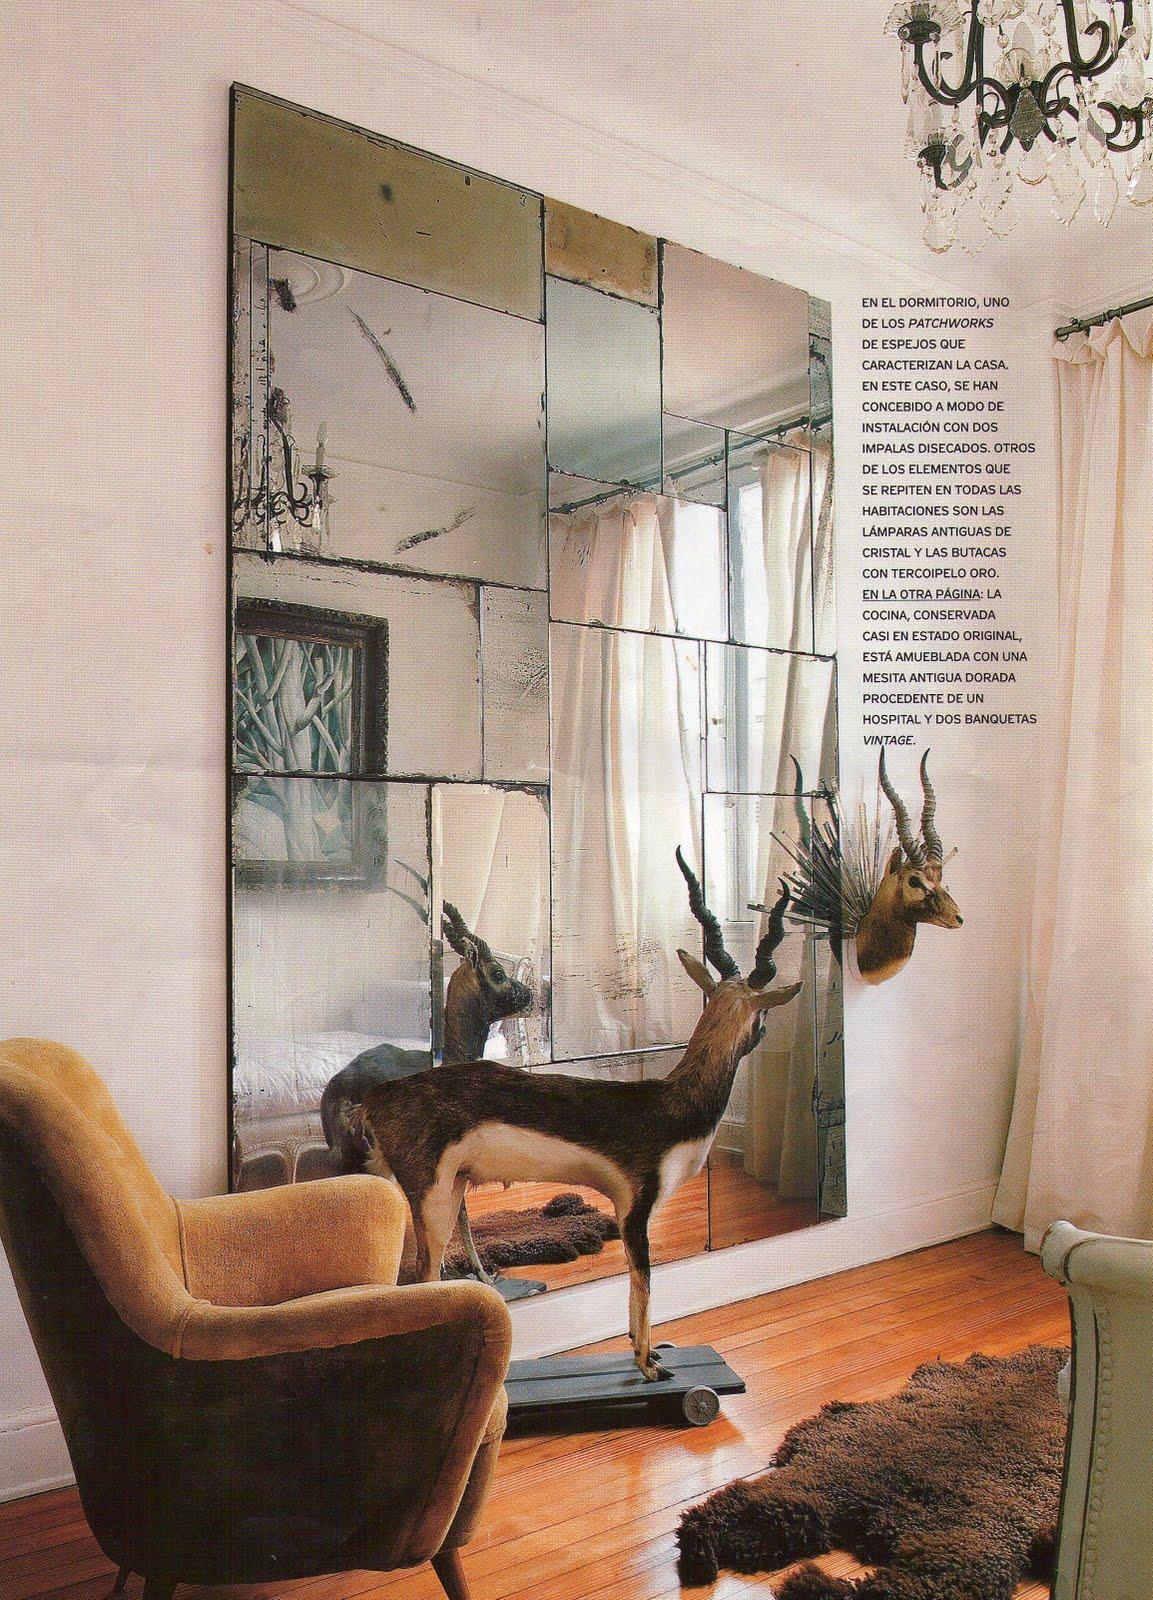 Salones Top! | Salons, Interiors and Mirror mirror